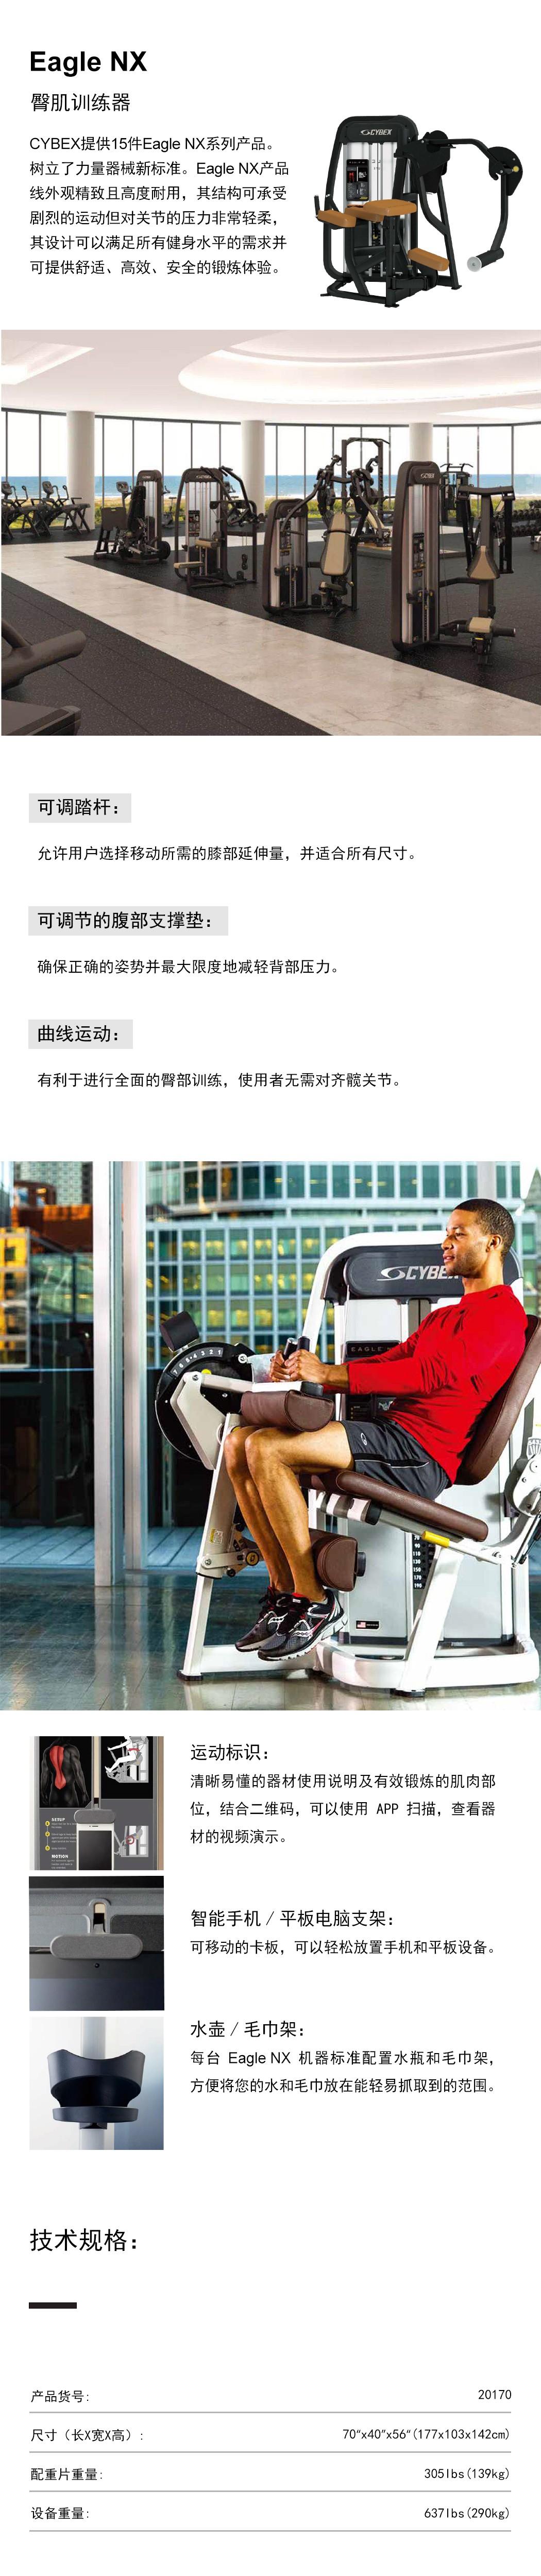 cybex-臀肌训练器.jpg